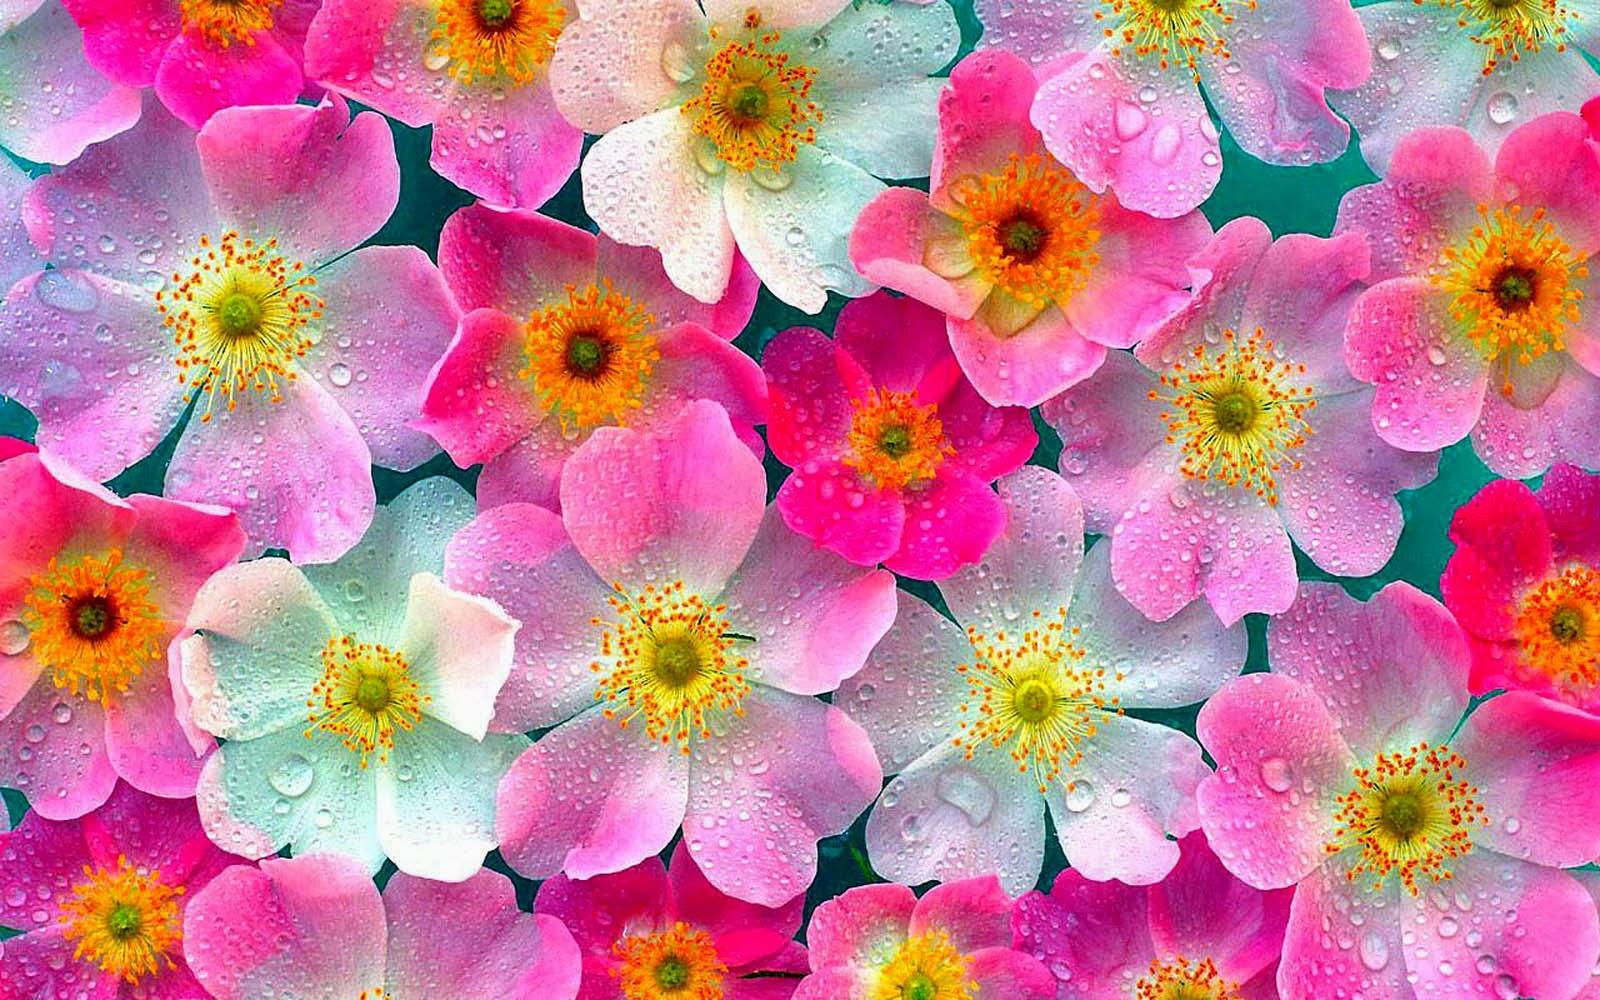 Gambar Wallpaper Cantik Pink A1 Wallpaperz For You